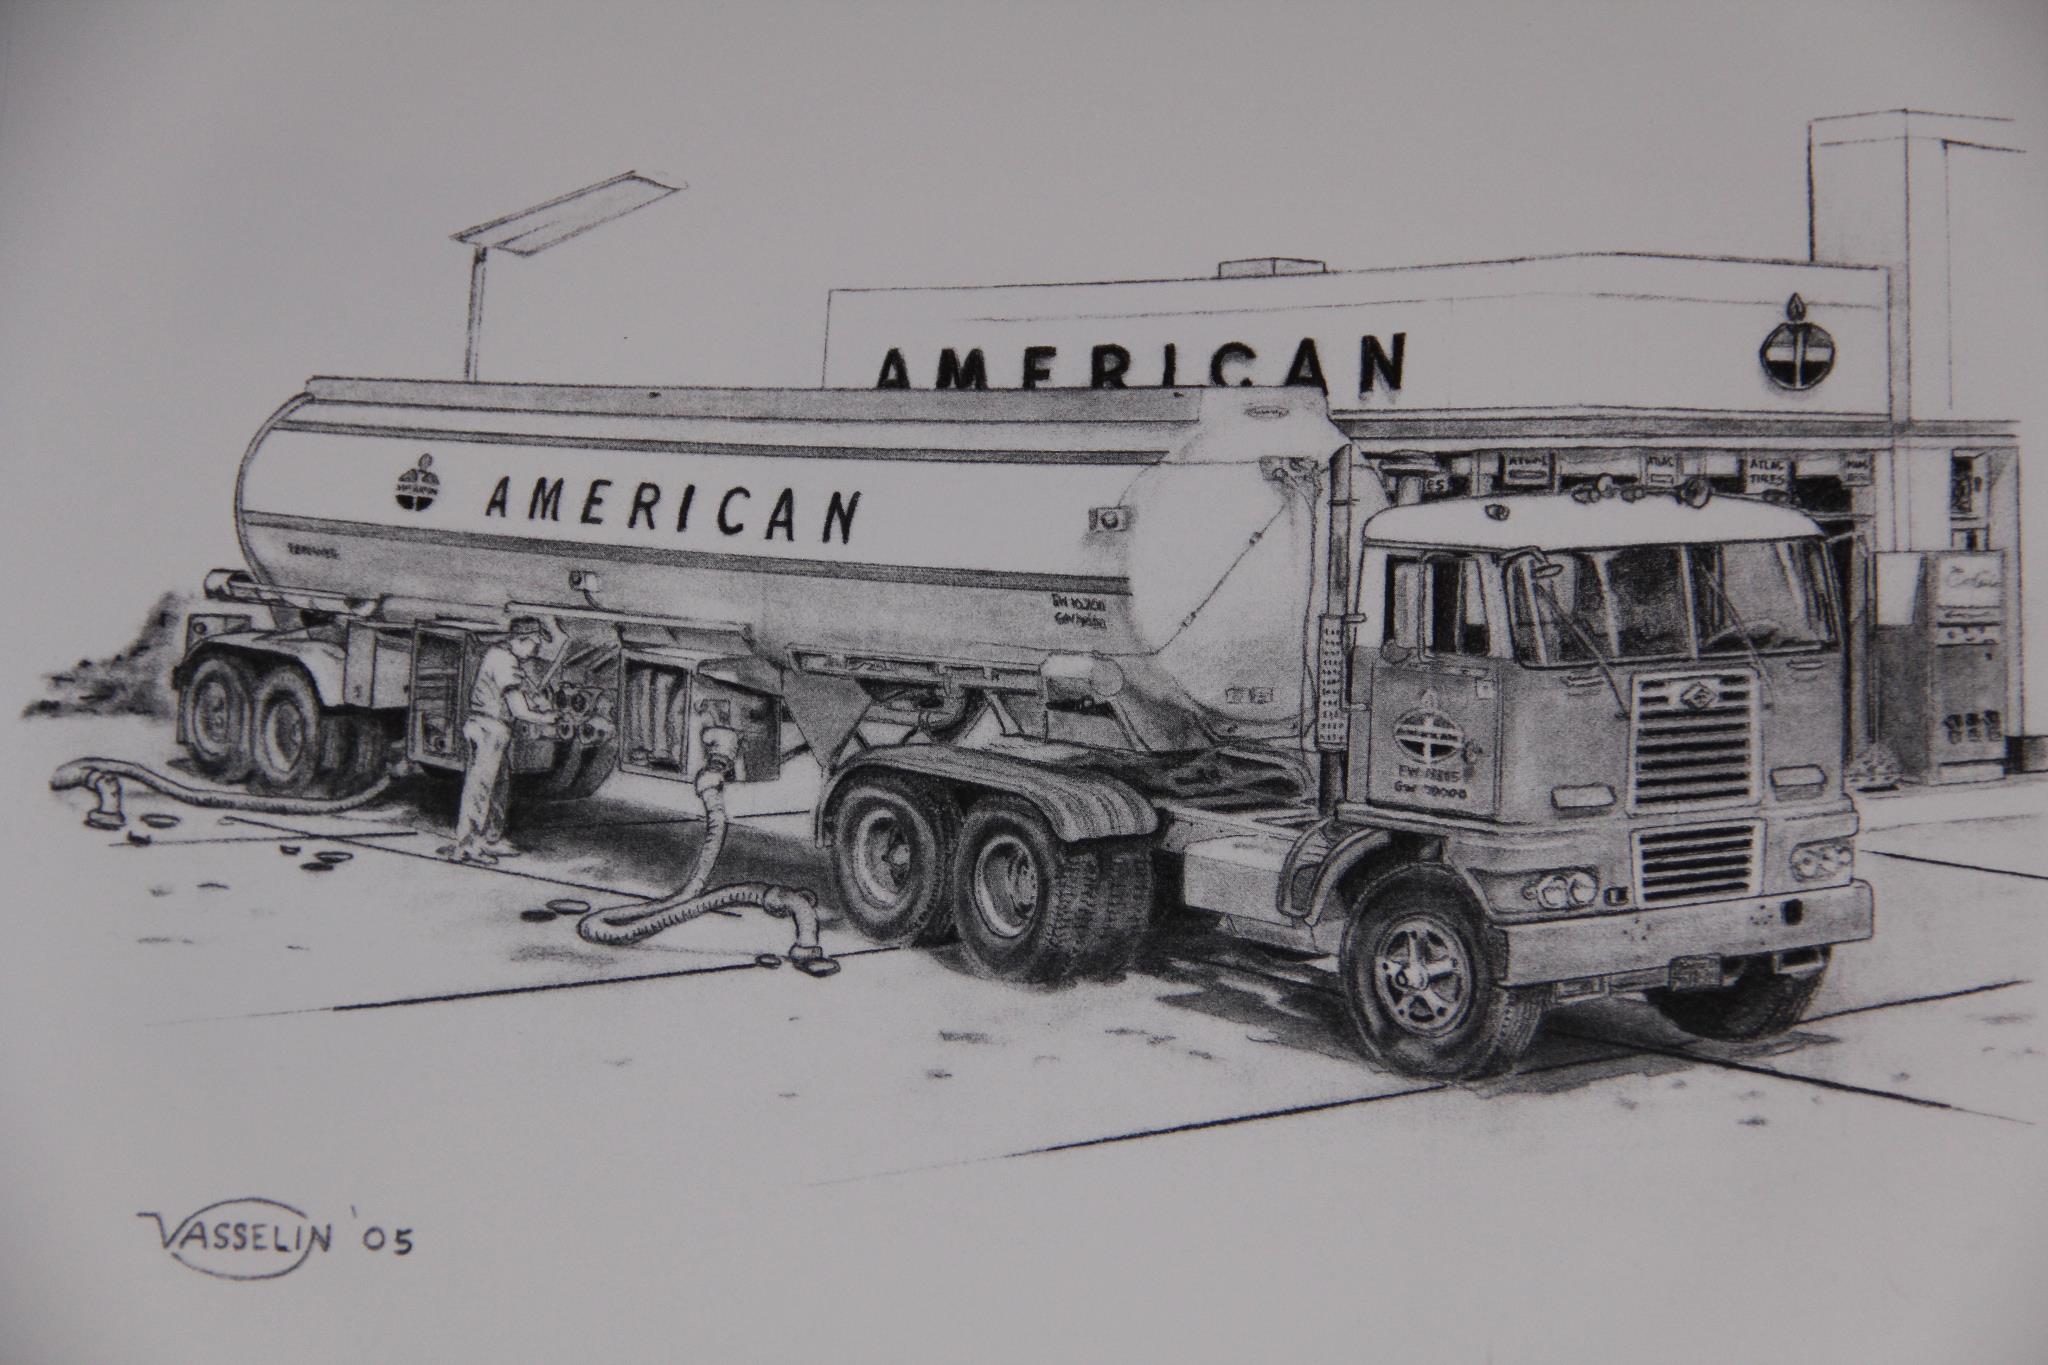 Vic-Vasselin-1960s-Diamond-Reo---pencil-drawin[1]